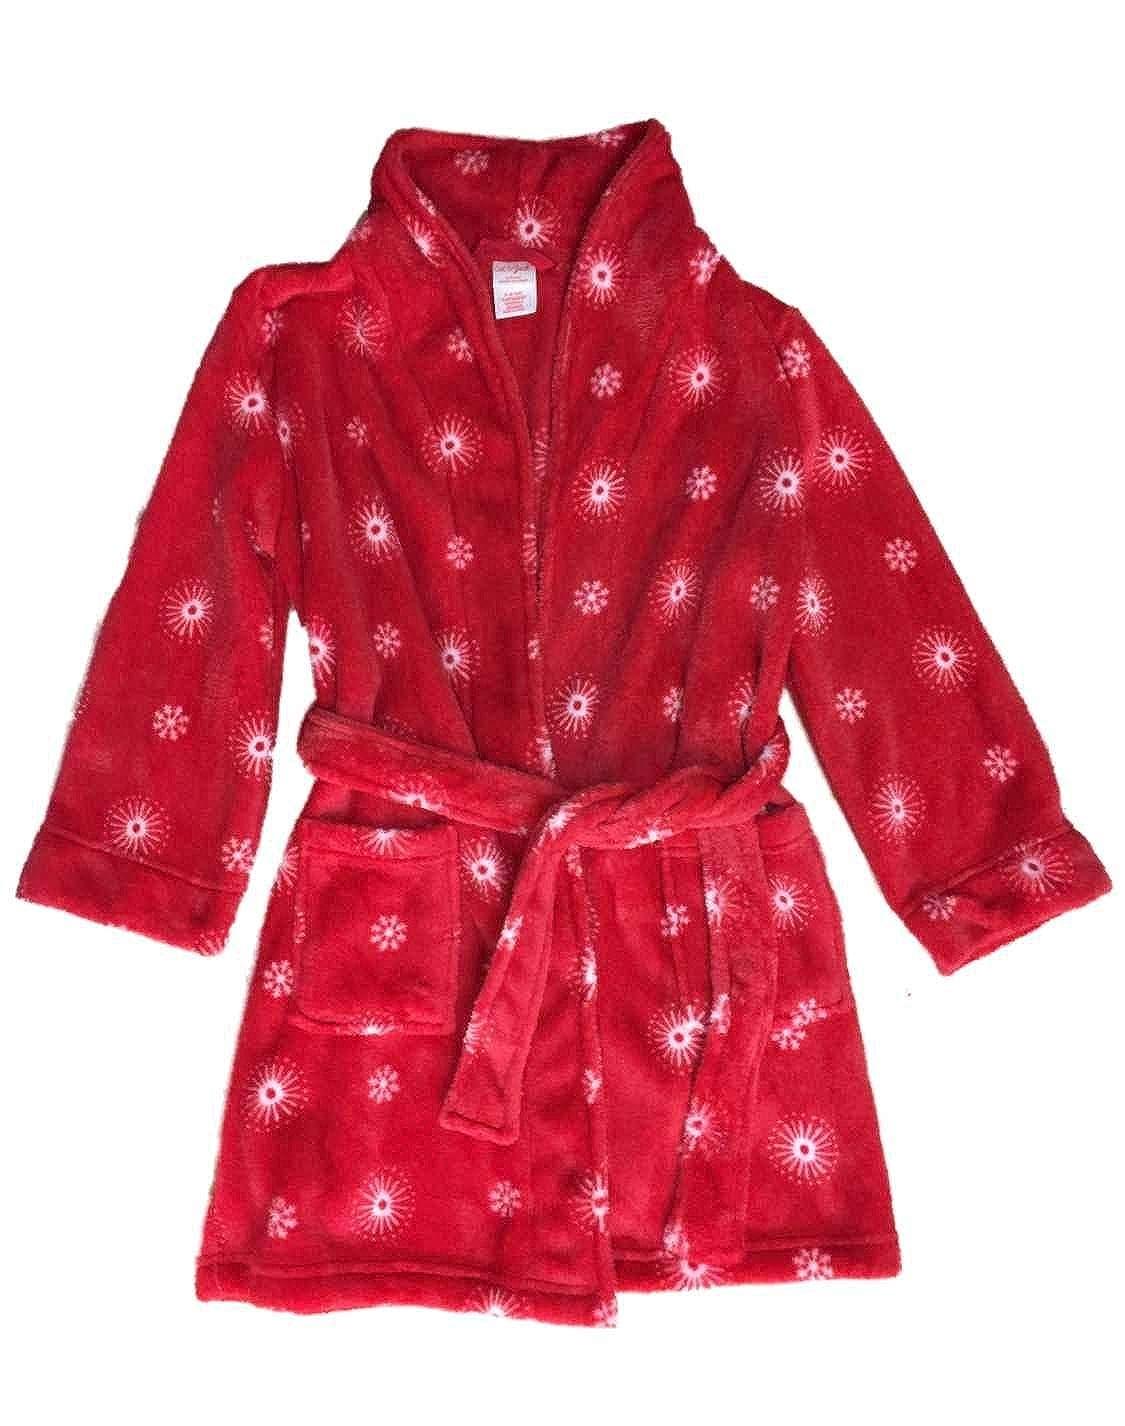 Robe Girls Red Luxe Fleece Winter Snowflakes Red Bathrobe